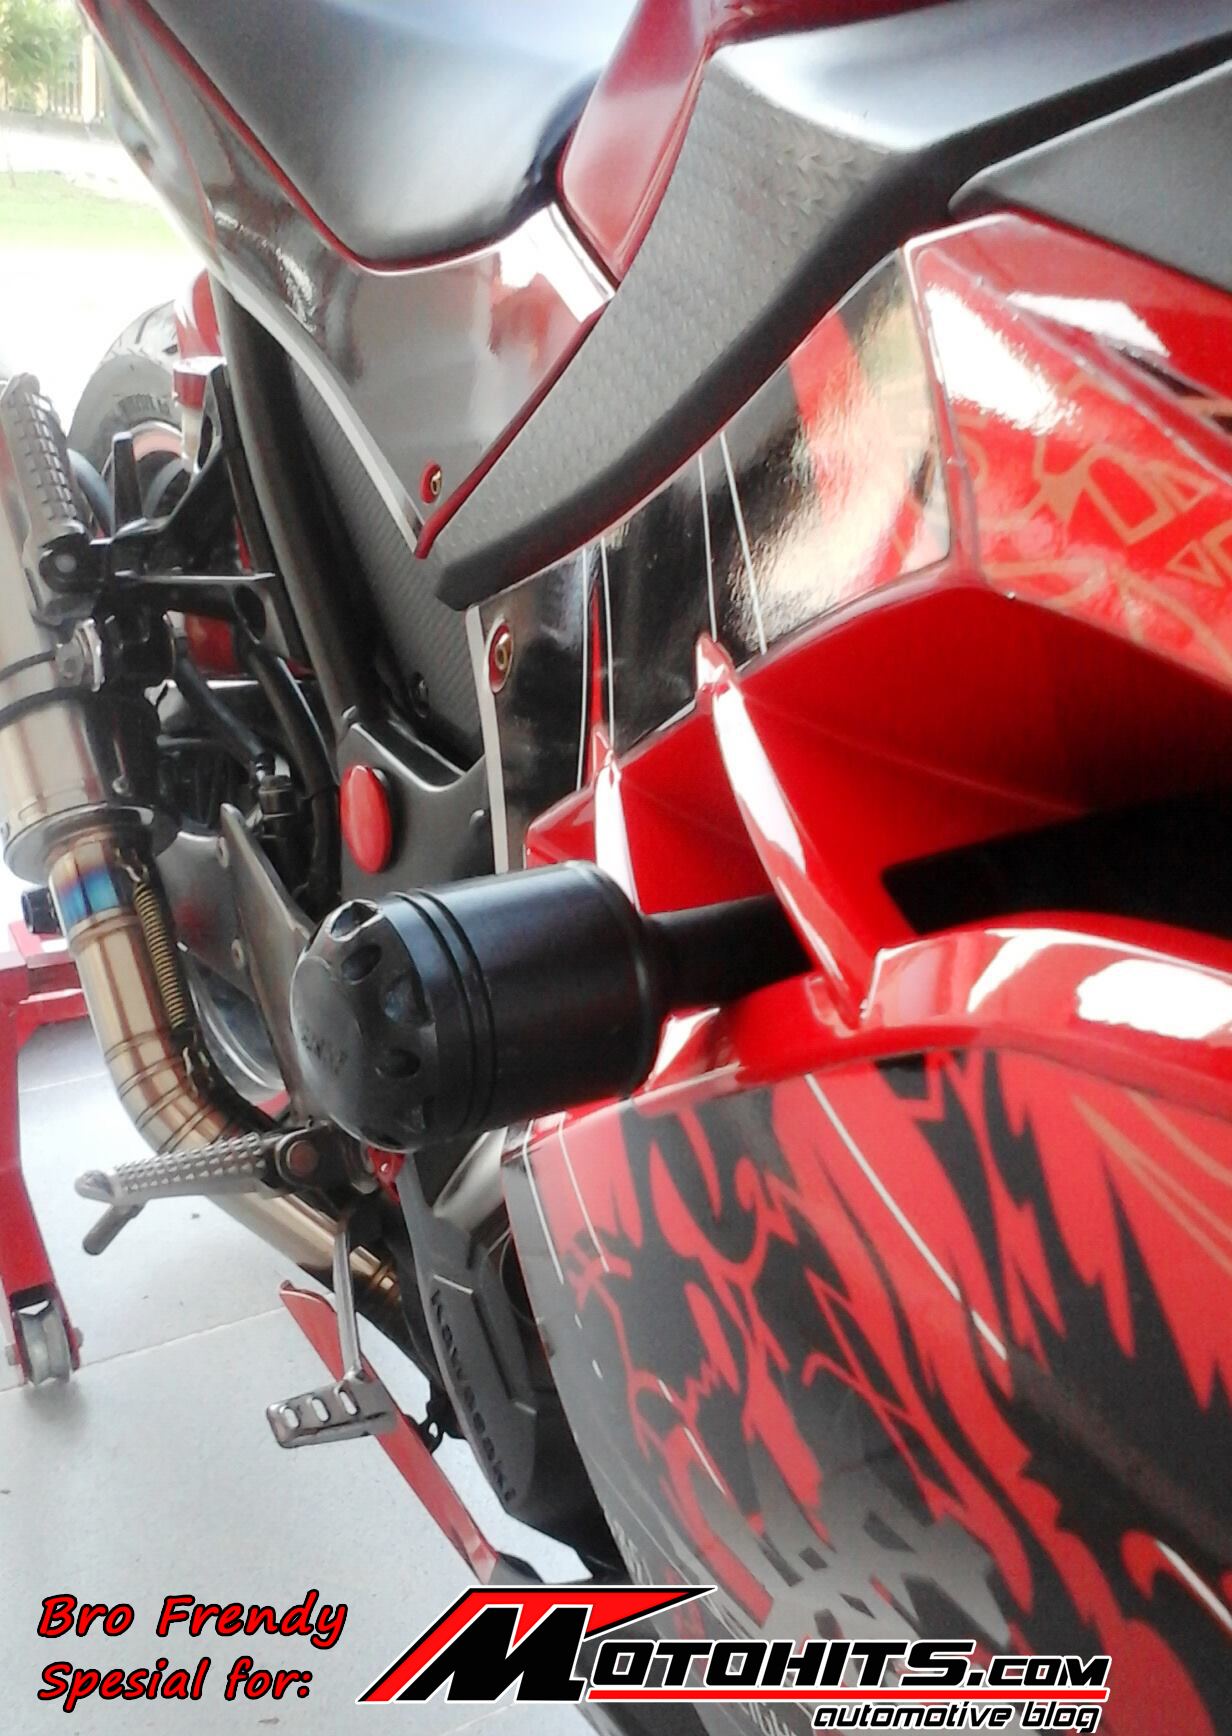 Modifikasi Kawasaki Ninja 250 Fi Milik Bro Frendy Lubis Mantap